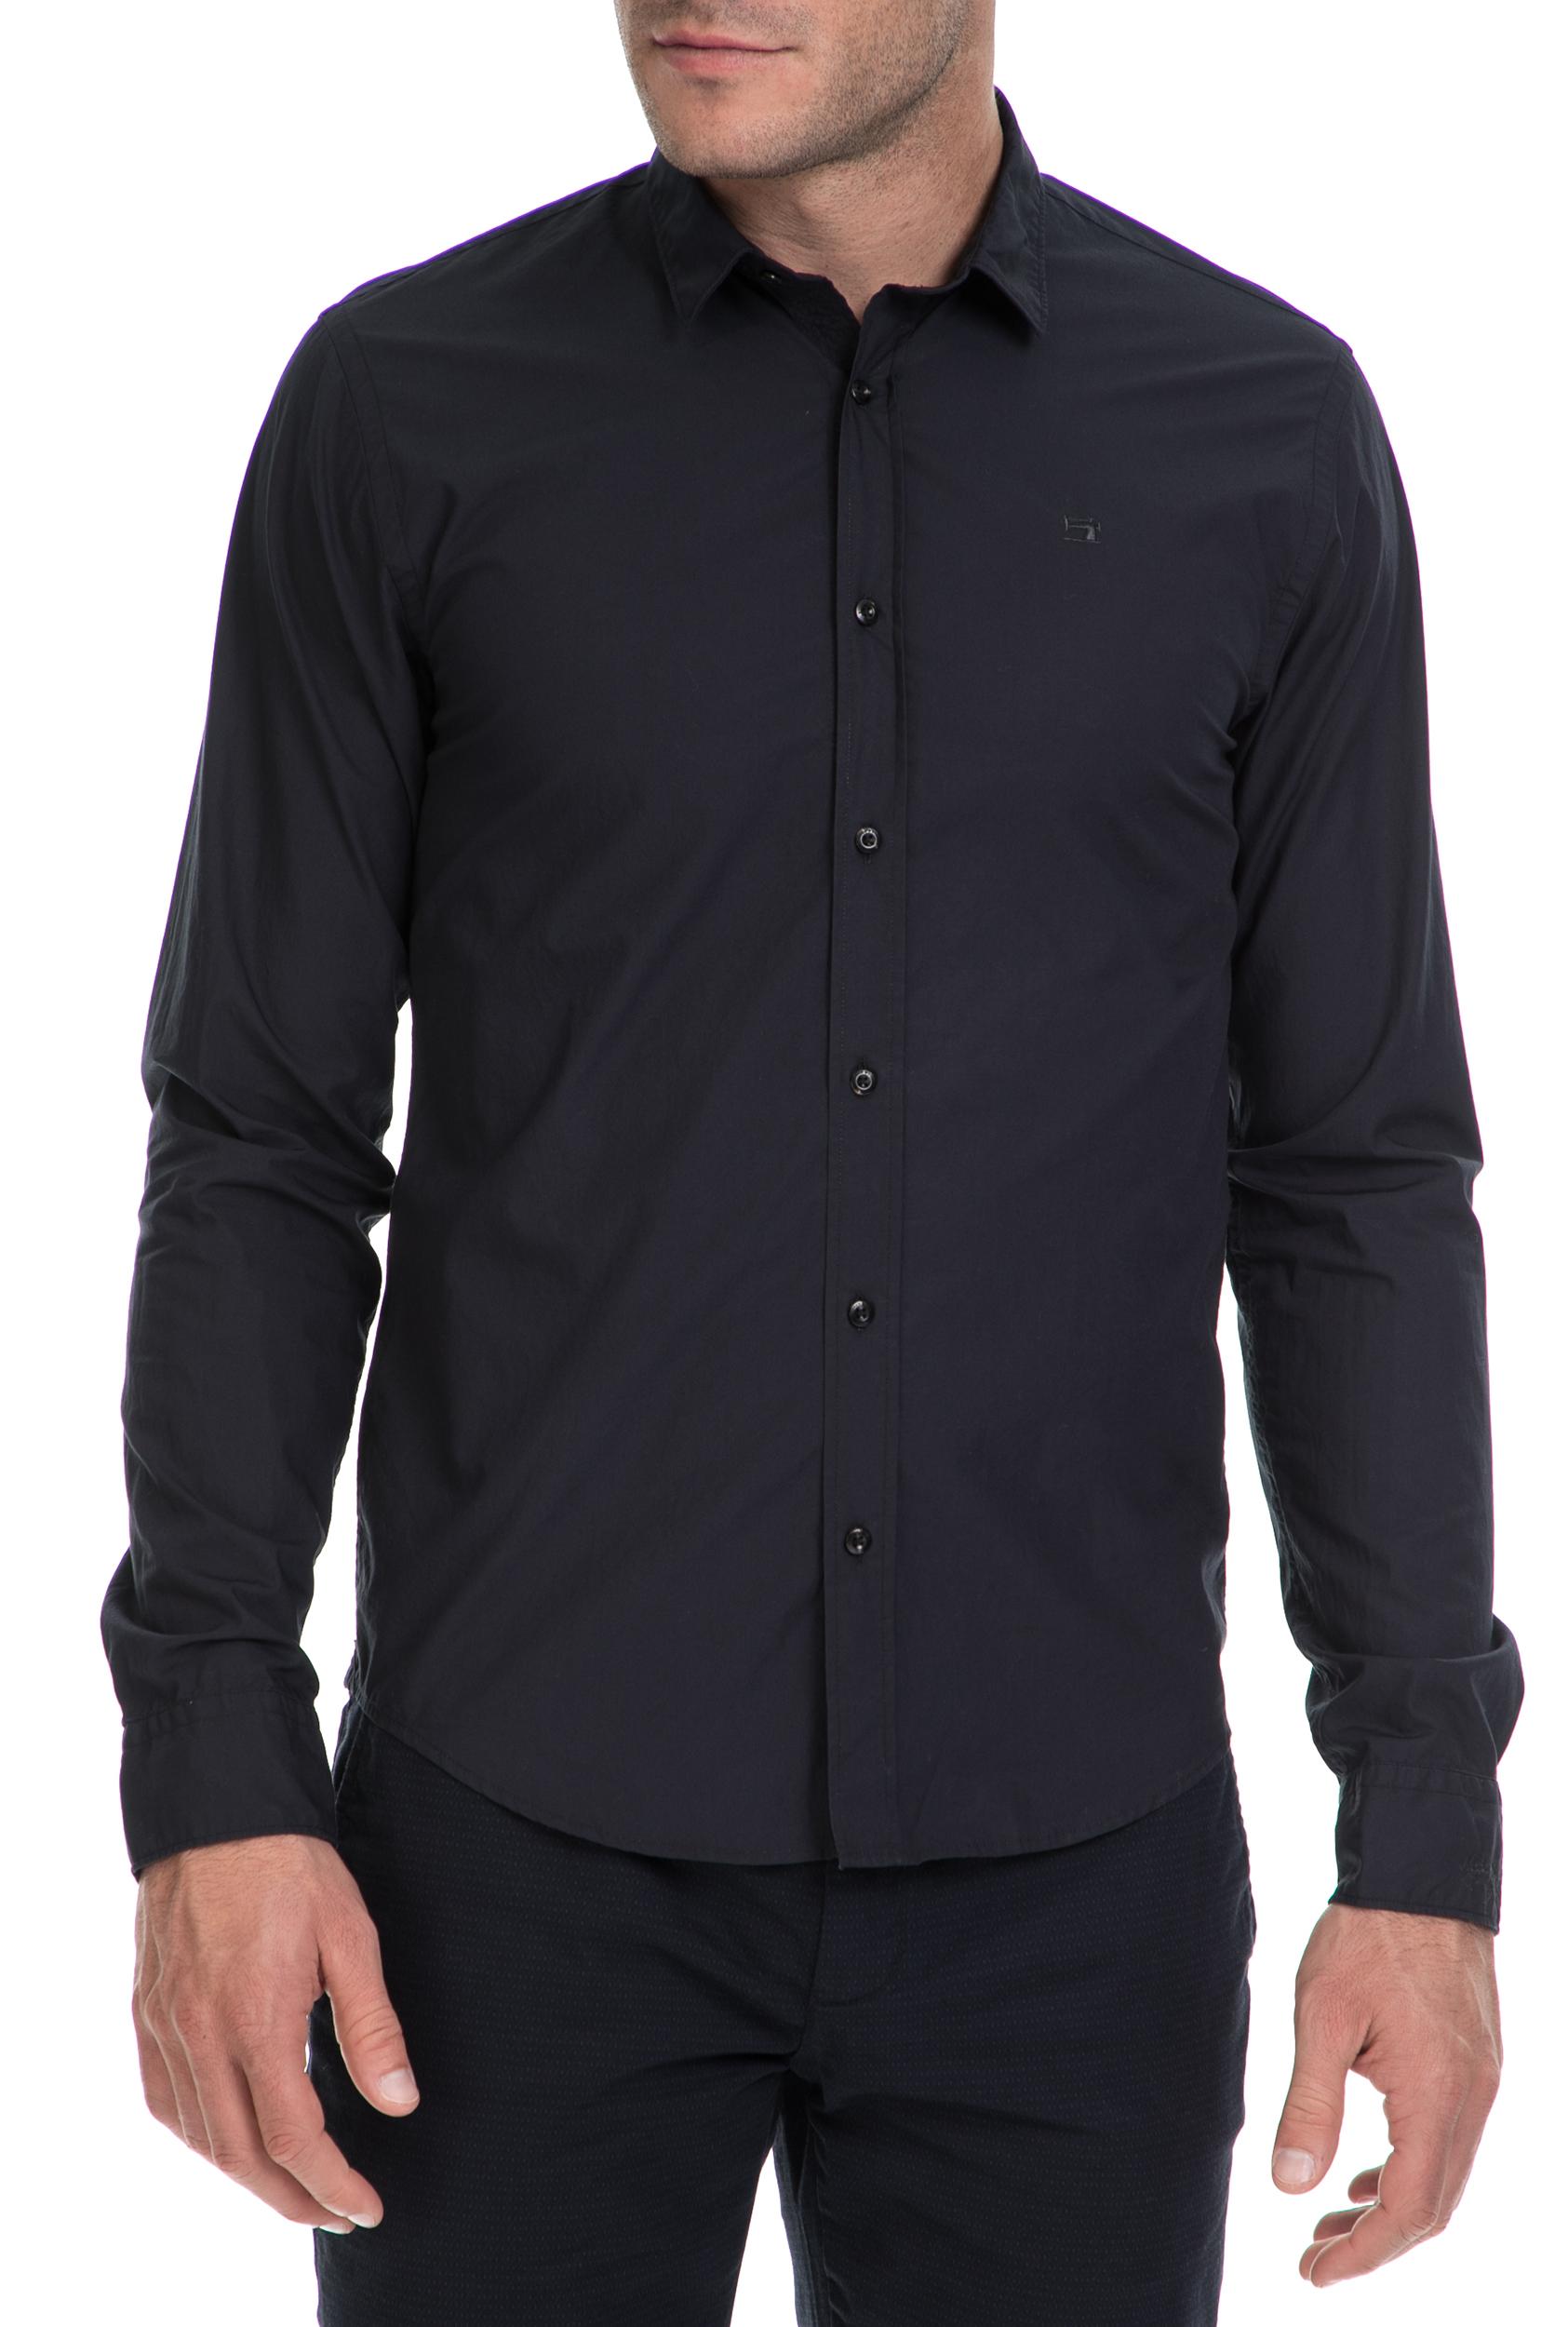 6e9e9a4397ff SCOTCH   SODA - Ανδρικό πουκάμισο SCOTCH   SODA μαύρο